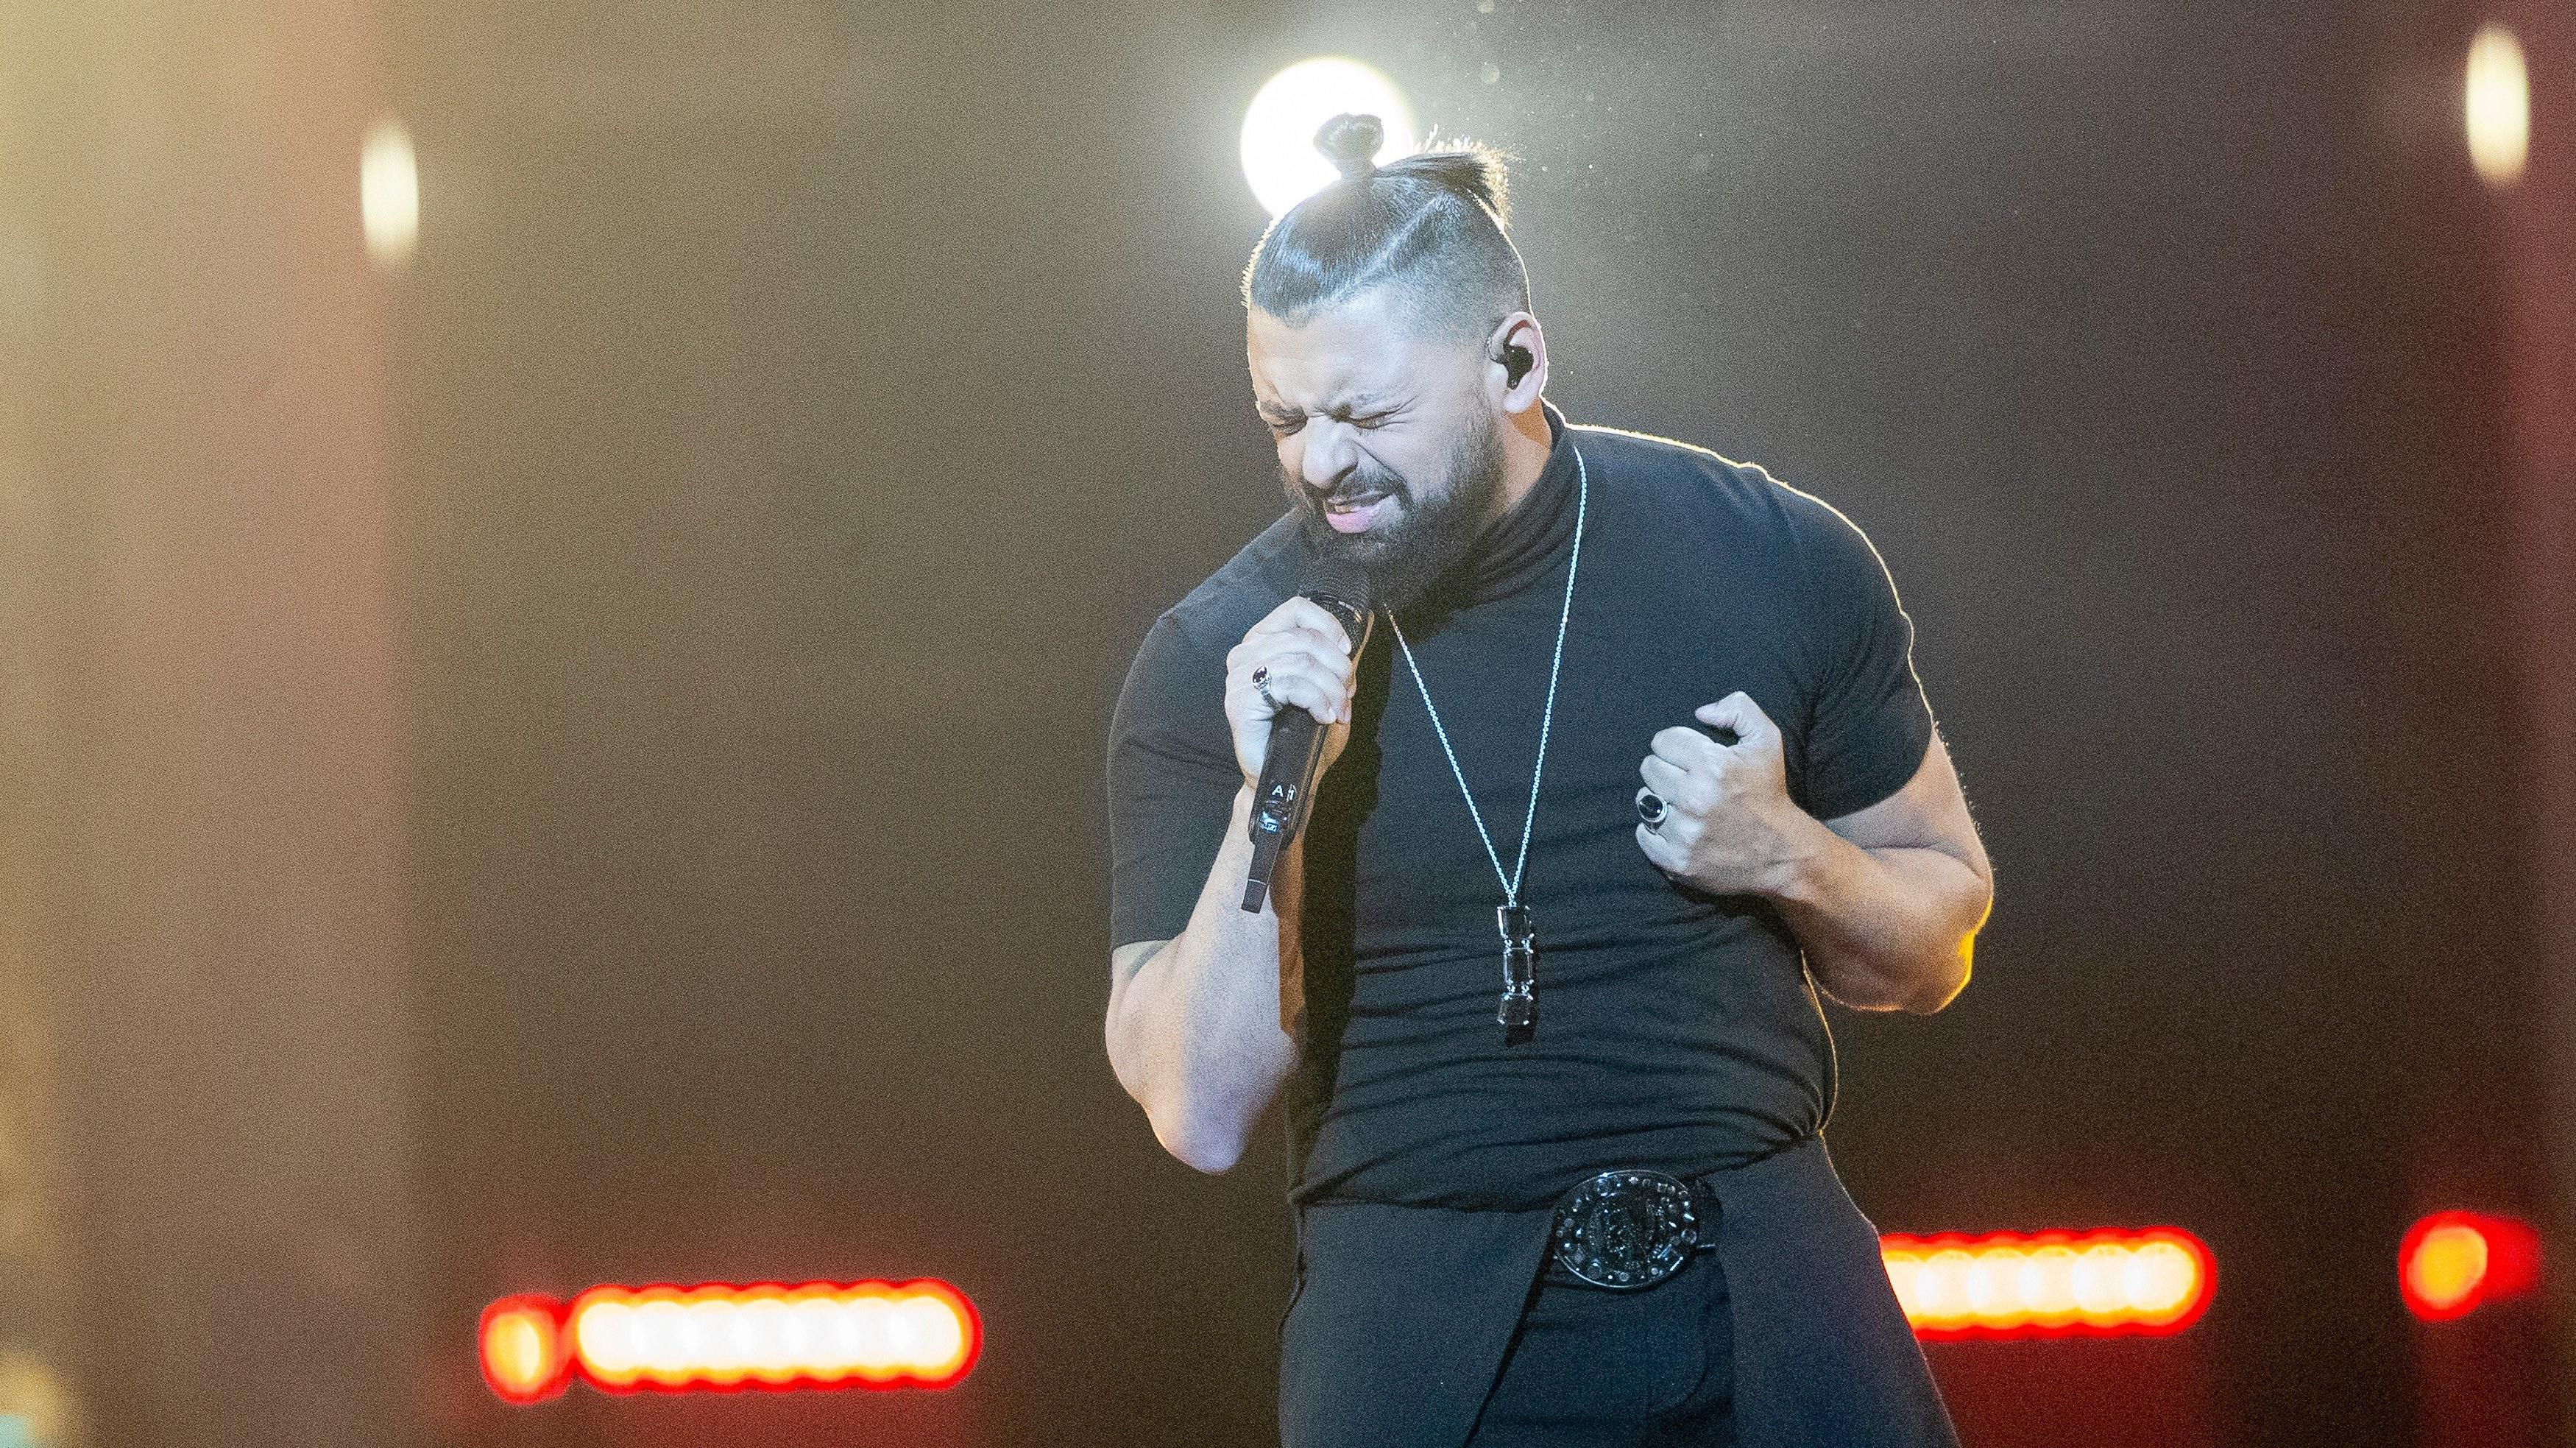 07 Ungarn Eurovision 2019